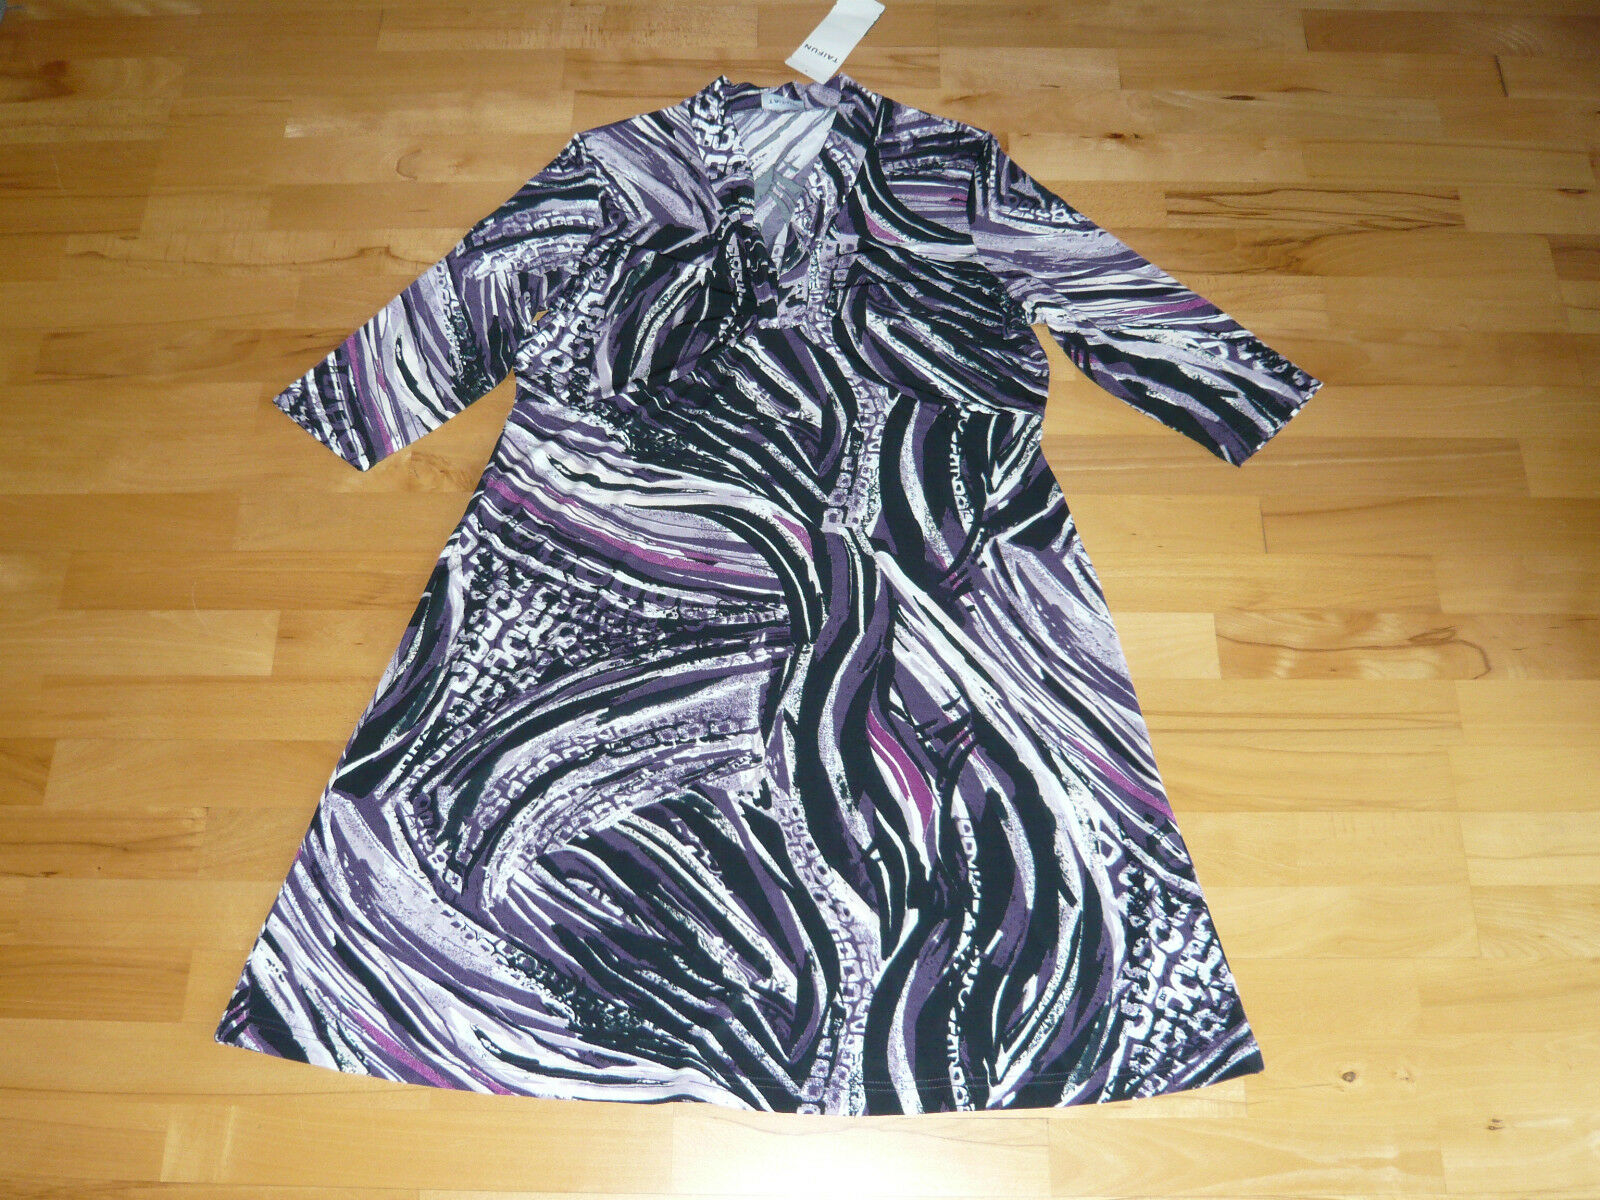 3 4-Arm-Kleid  Stretchkleid v. TAIFUN by GERRY WEBER, Gr. 44, lila-gem., NEU